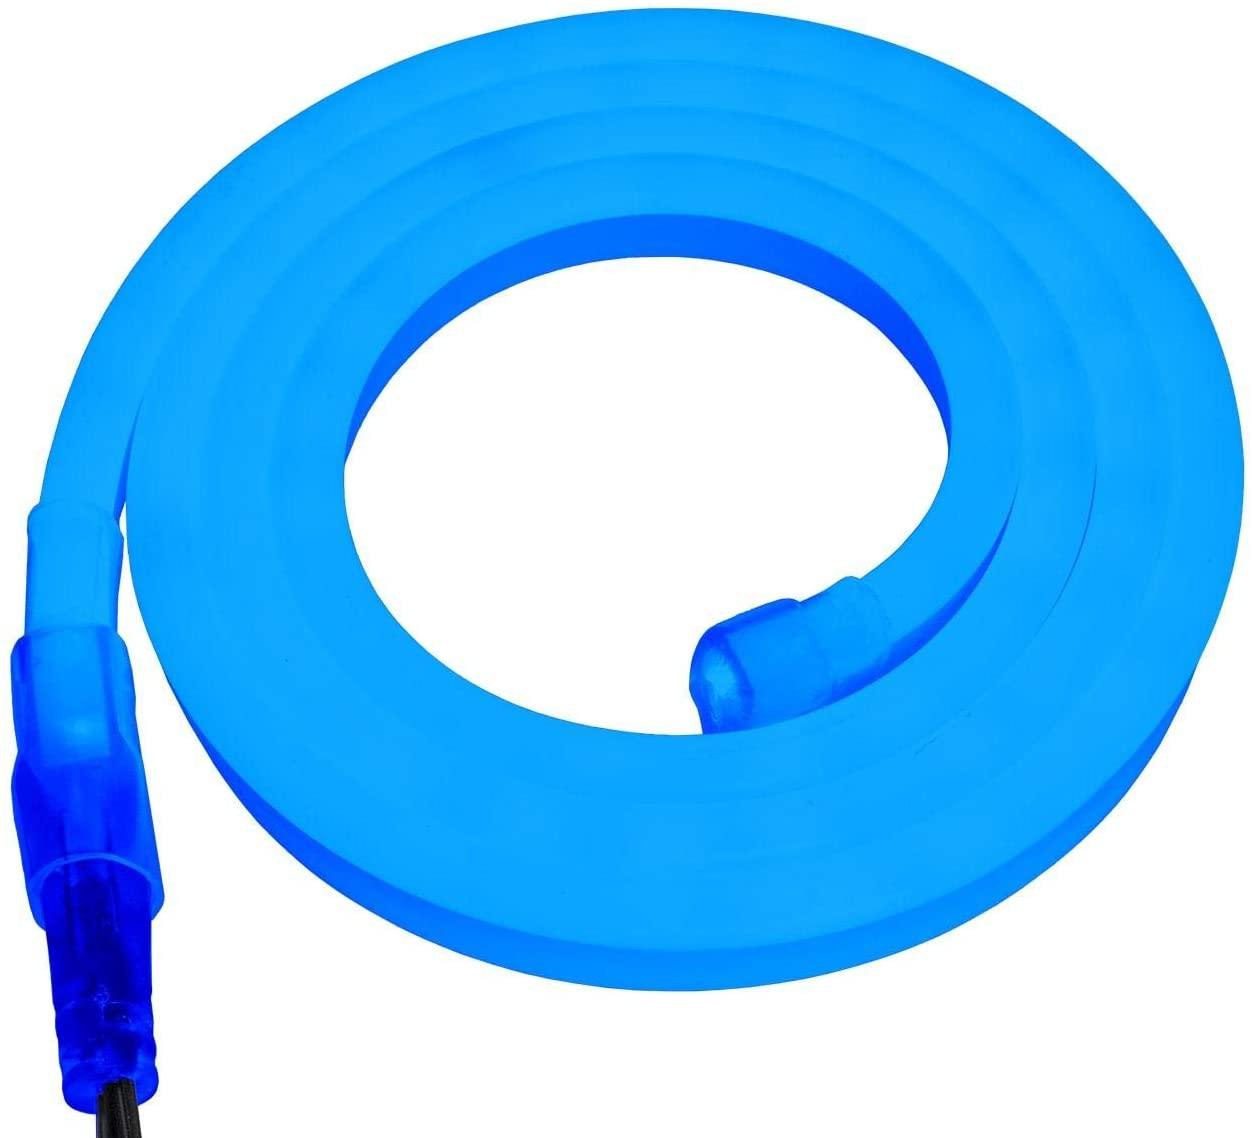 Brilliant Brand Lighting Blue SMD LED Neon Strip Light - 120 Volt - Custom Cut - 14.76 Feet